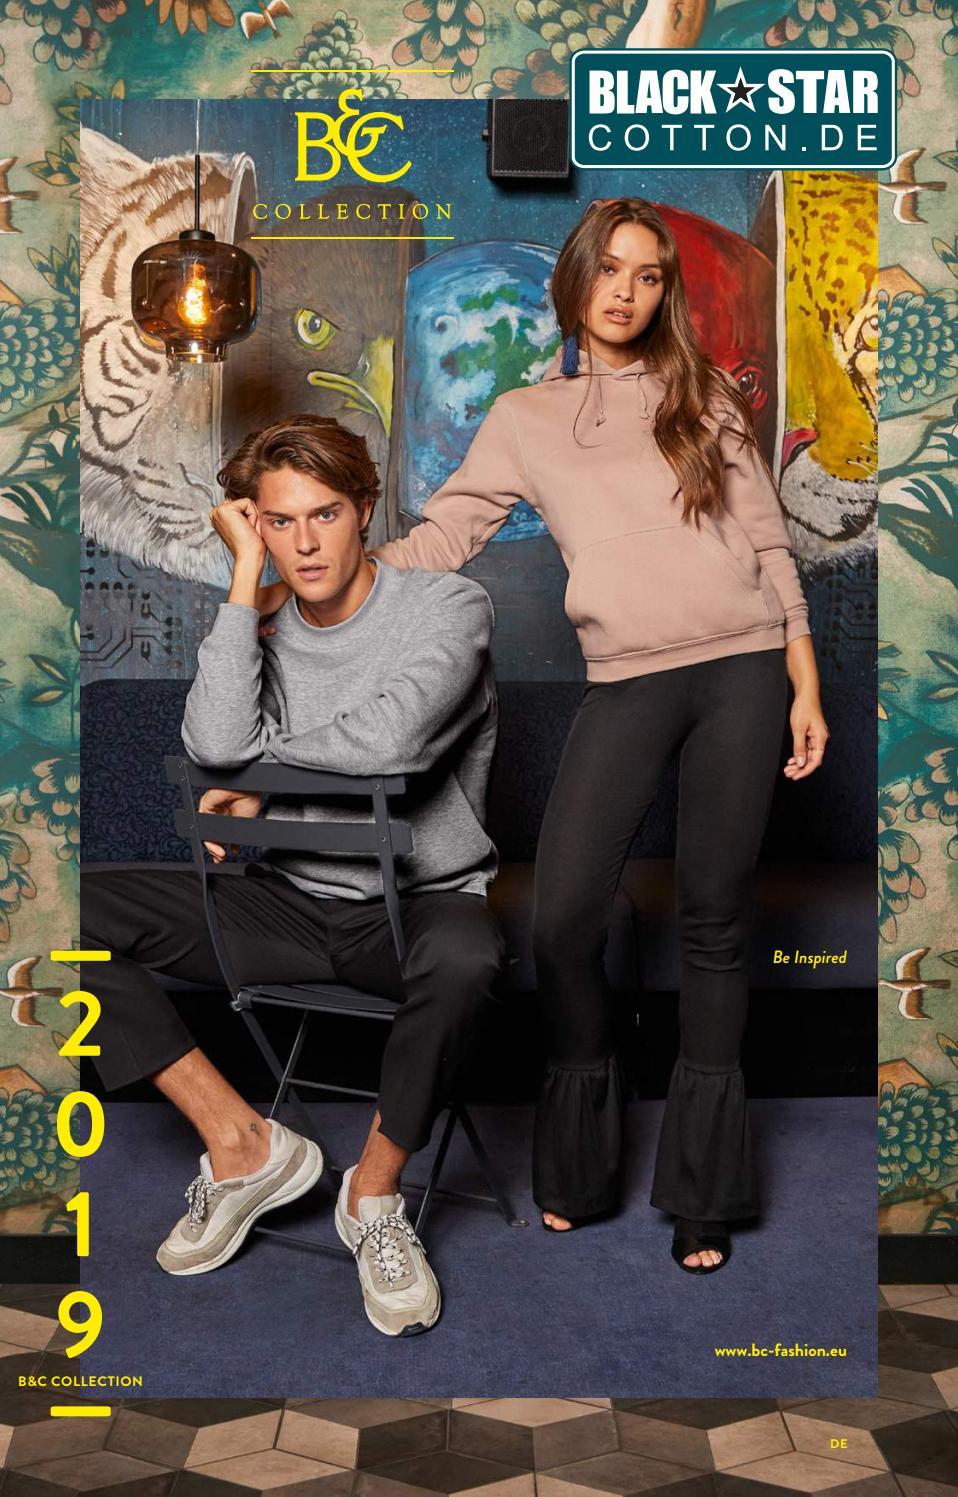 Bc catalogue 2019 full bs de web by Black Star T Shirt print